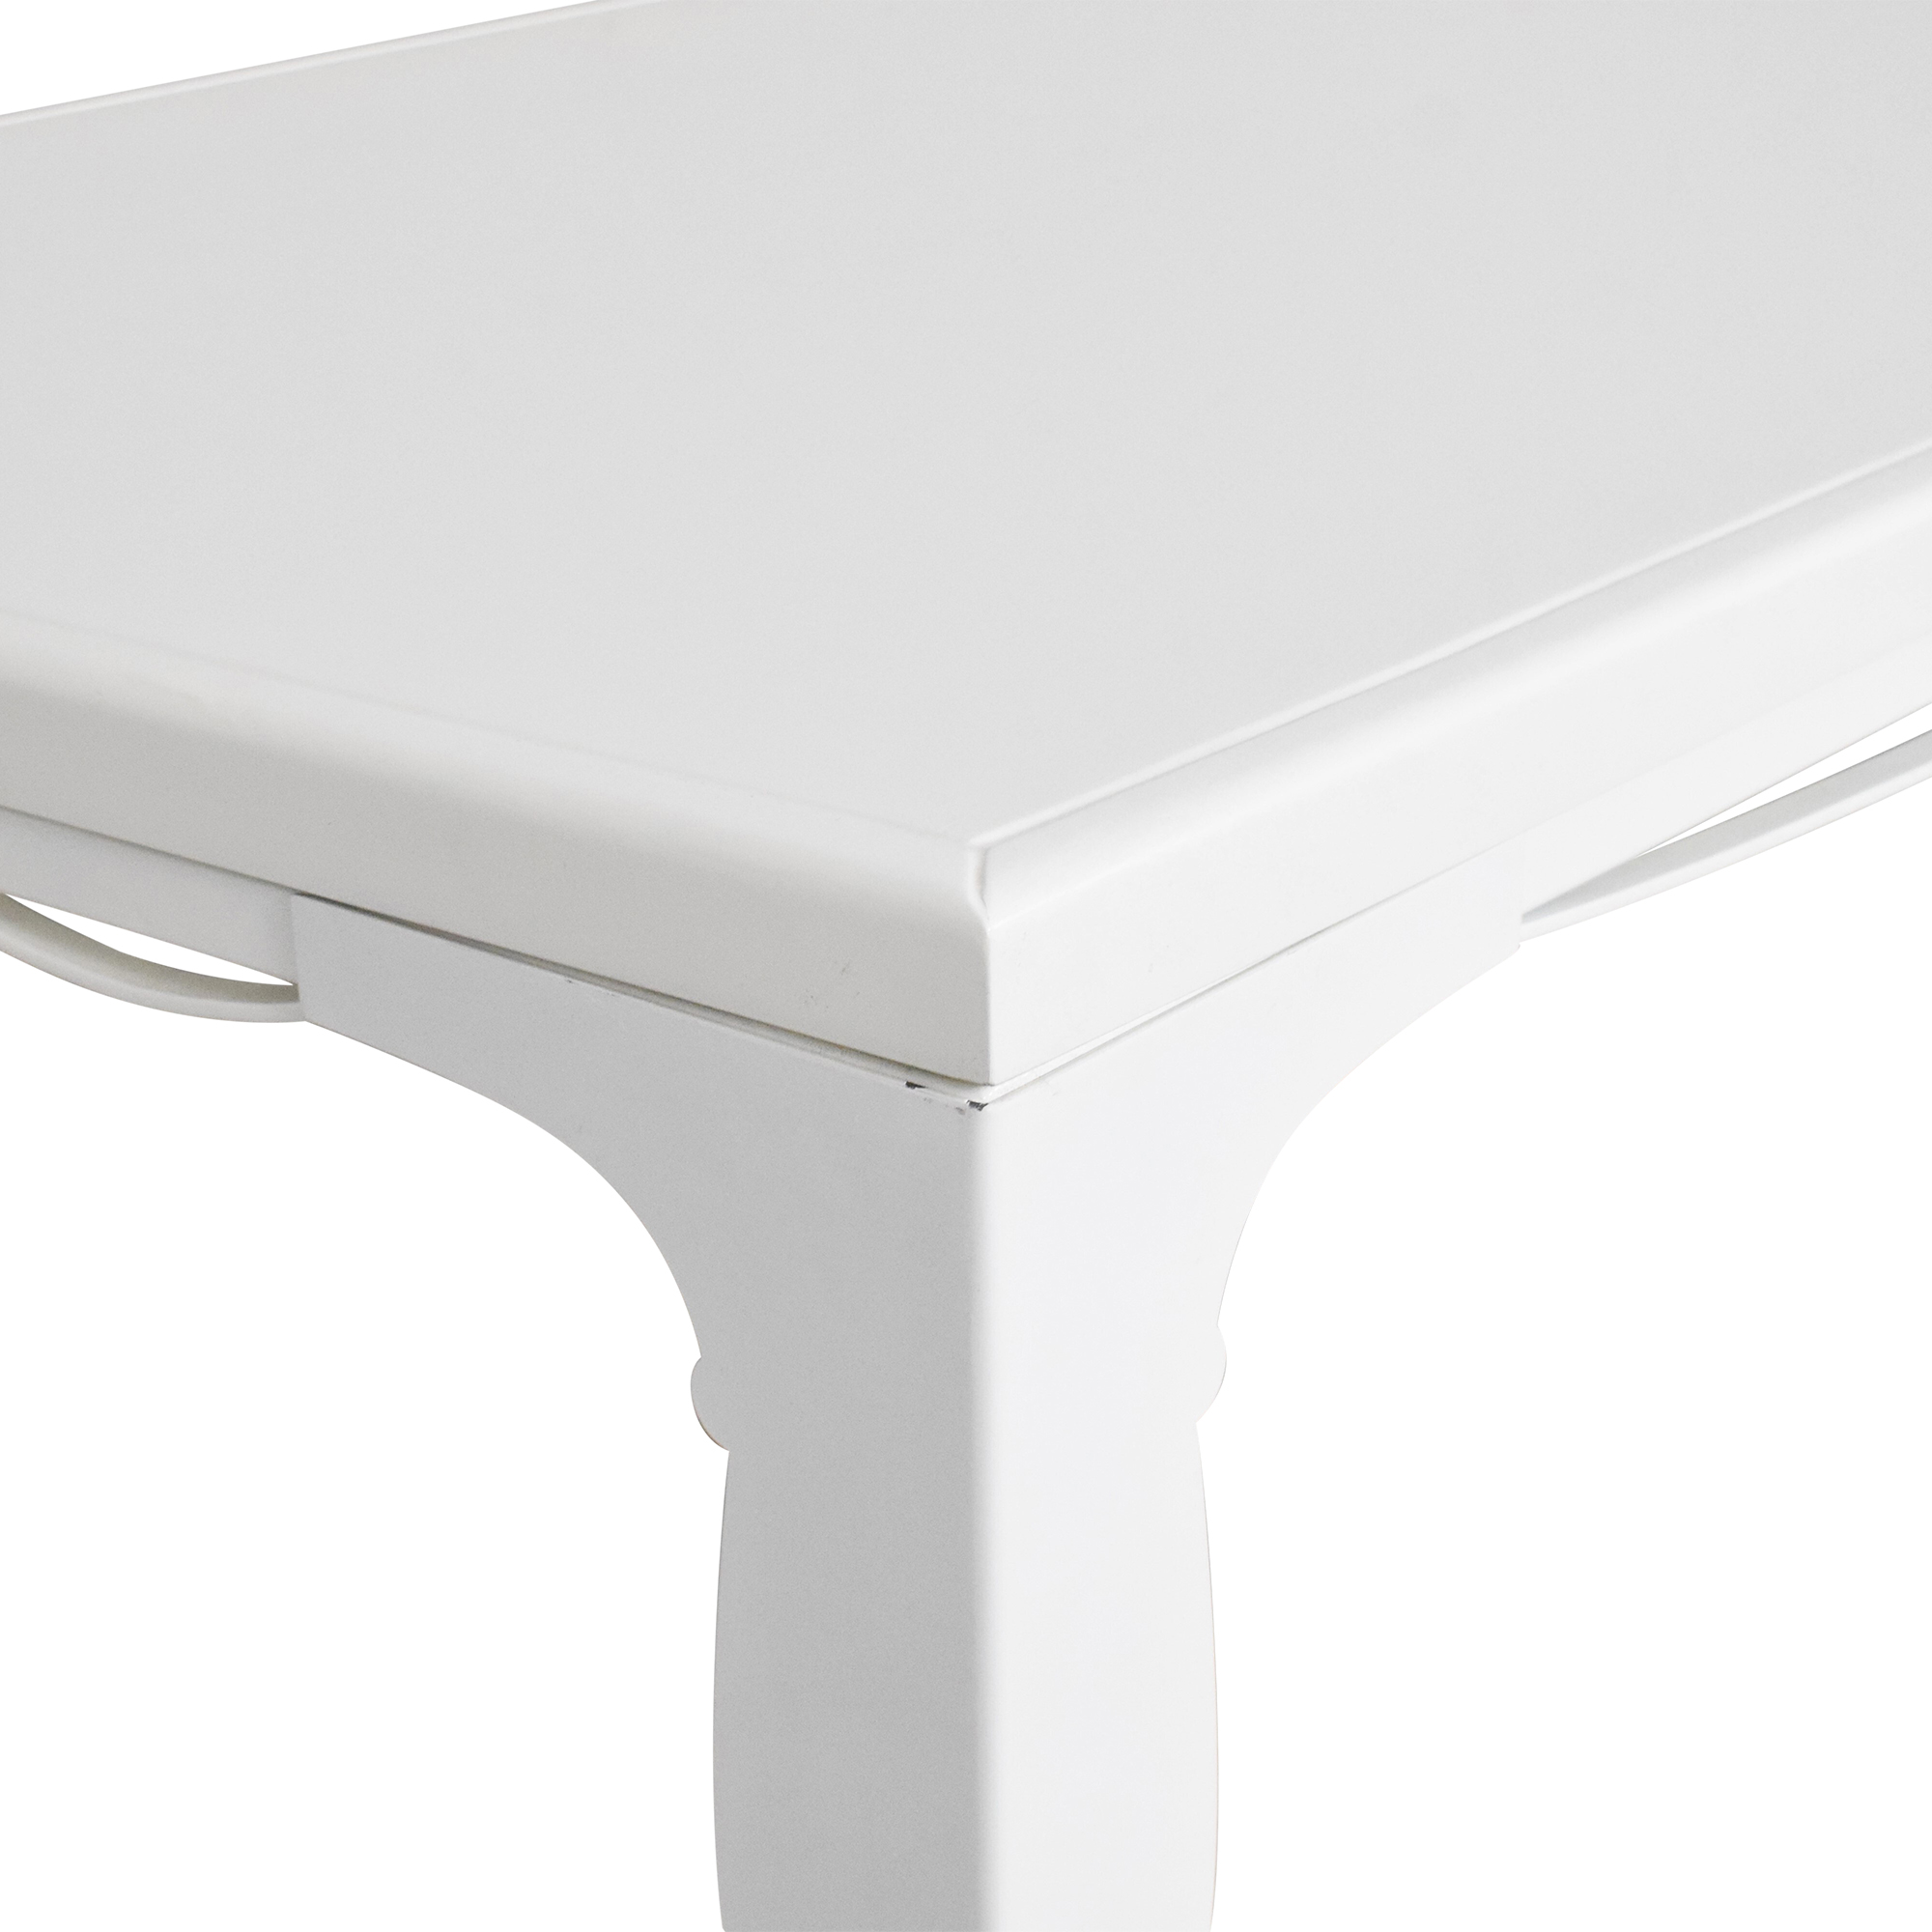 Modloft Modloft Rectangular Dining Table pa